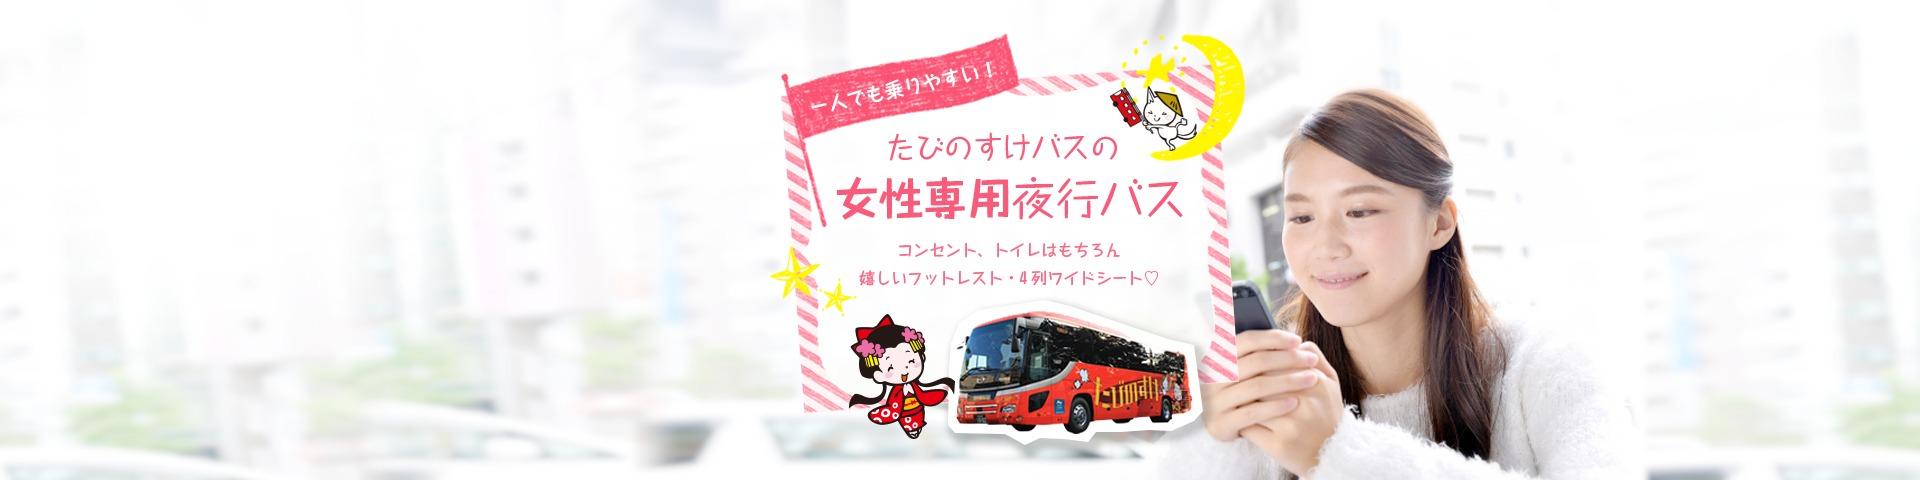 女性専用夜行バス